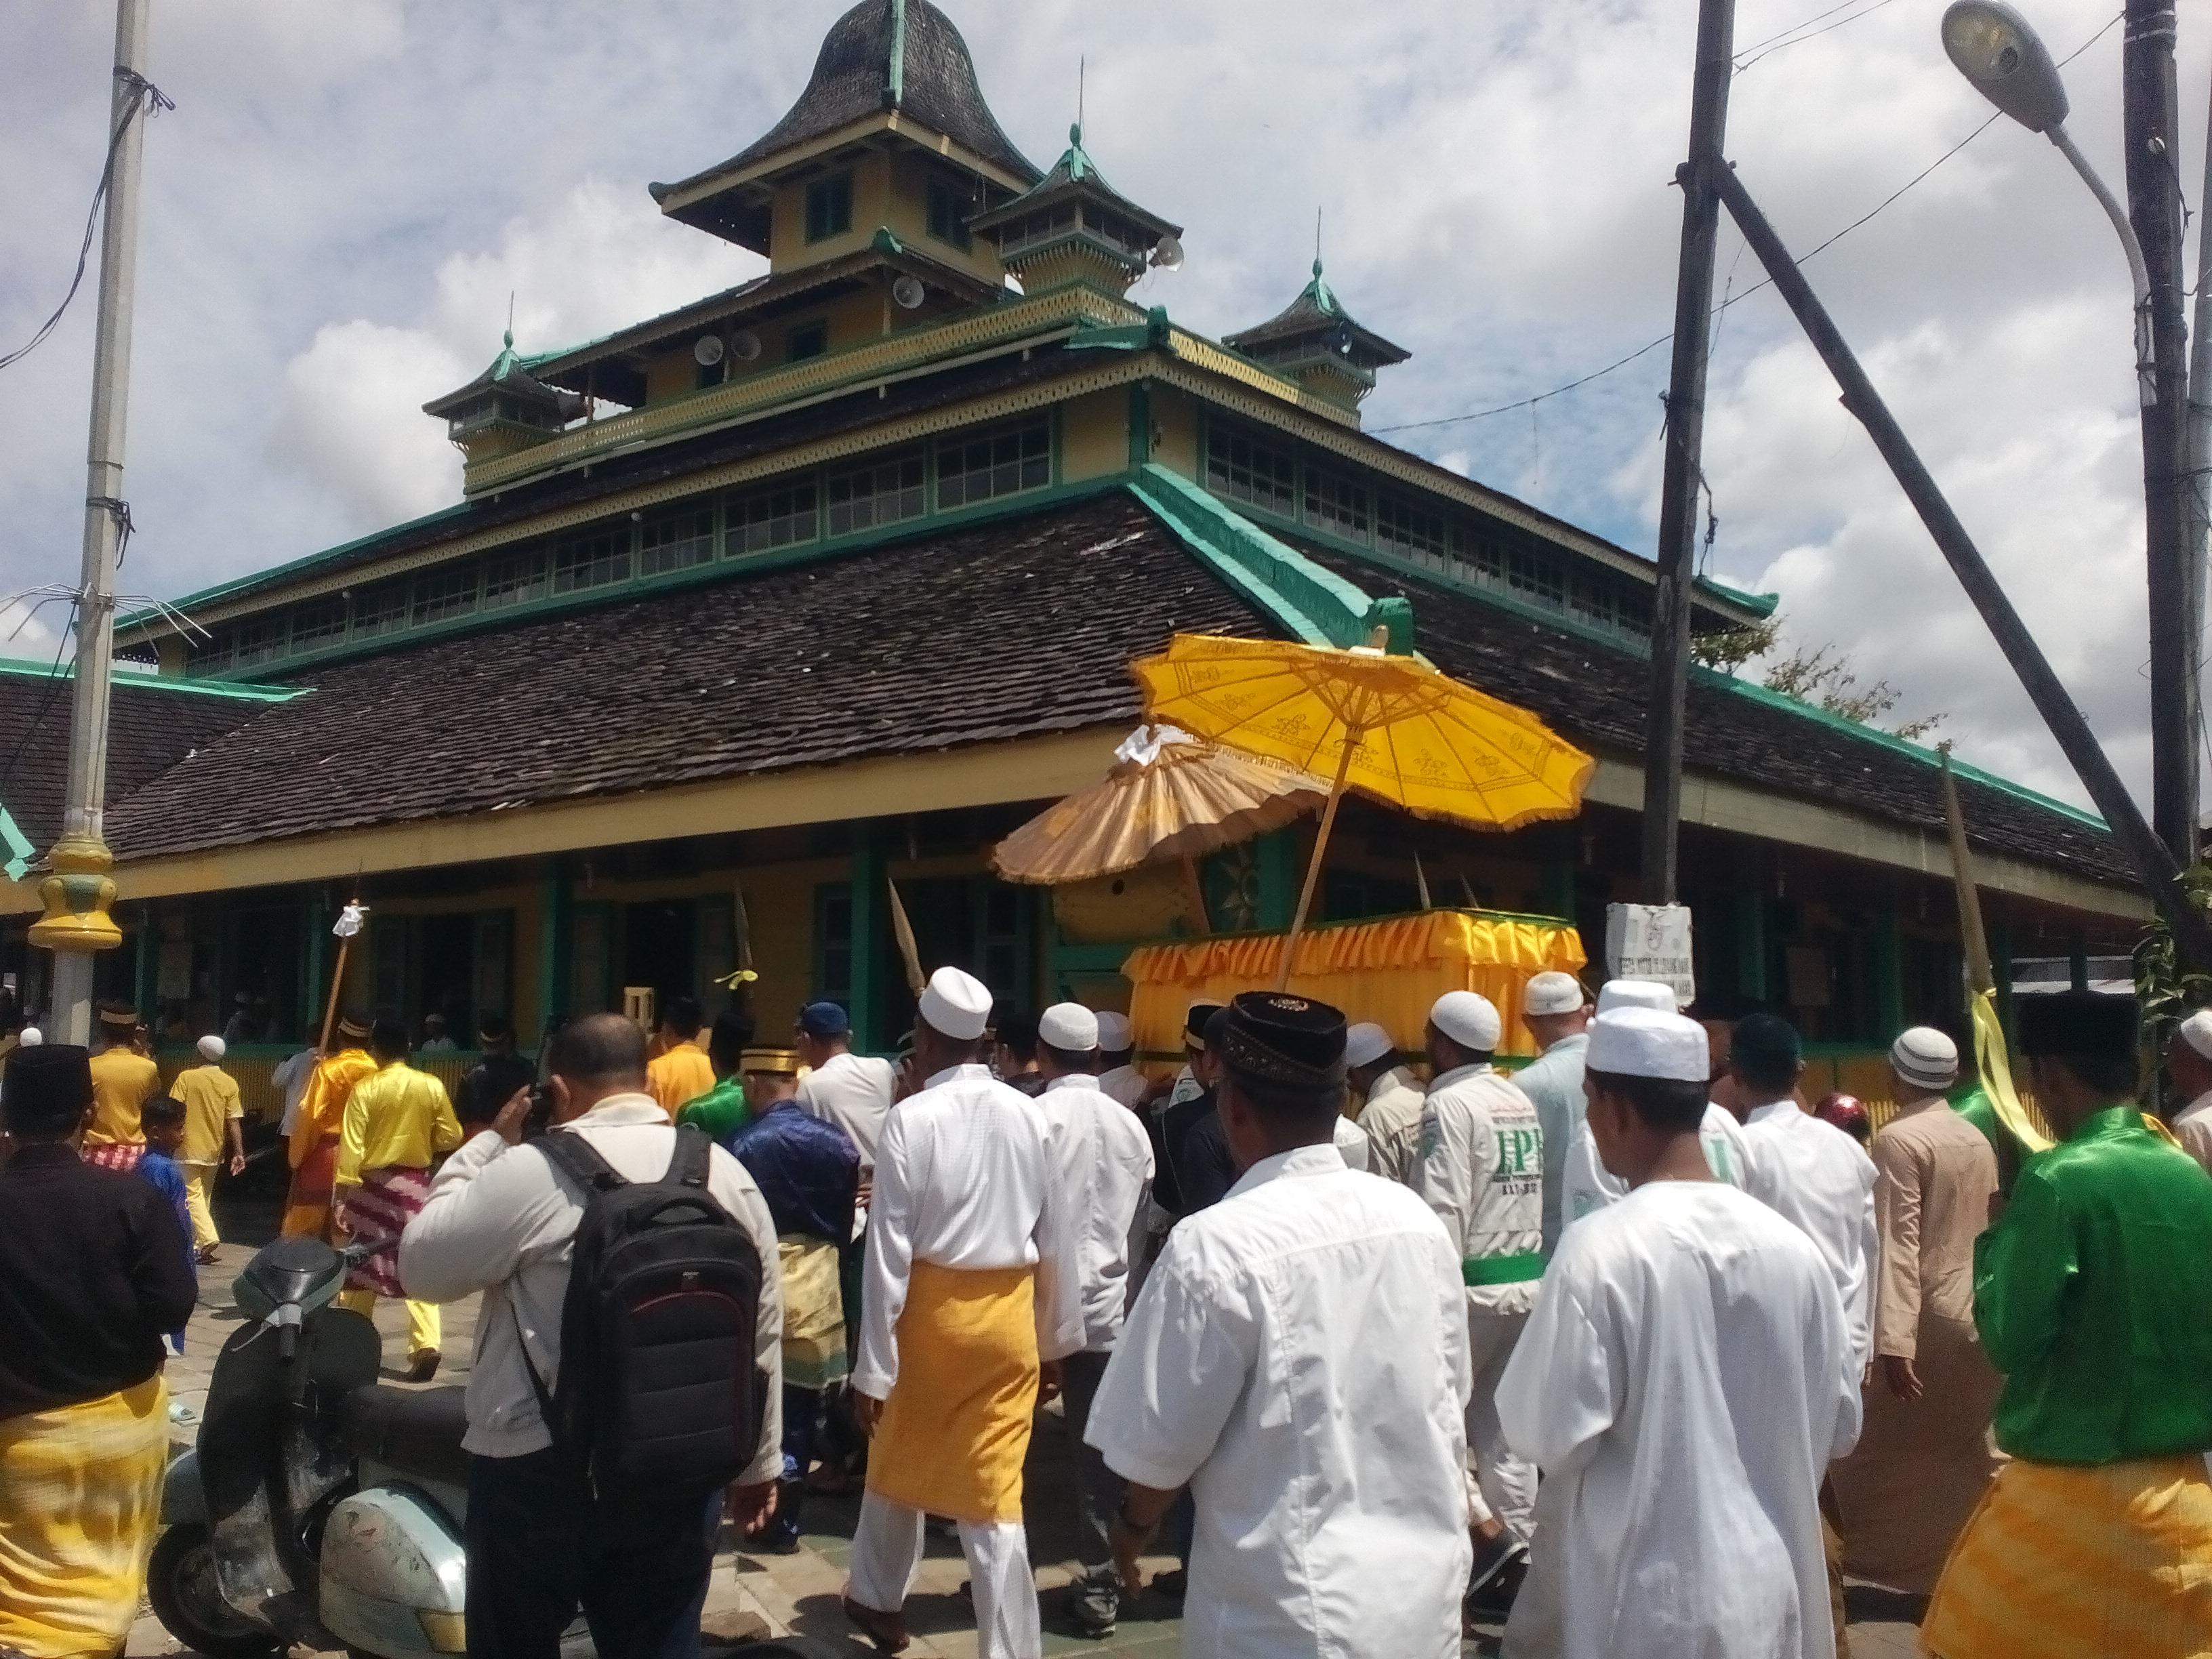 Sultan Dibawa Masjid Jami Sebelum Makam Batulayang Foto Agustiandi Pontianak